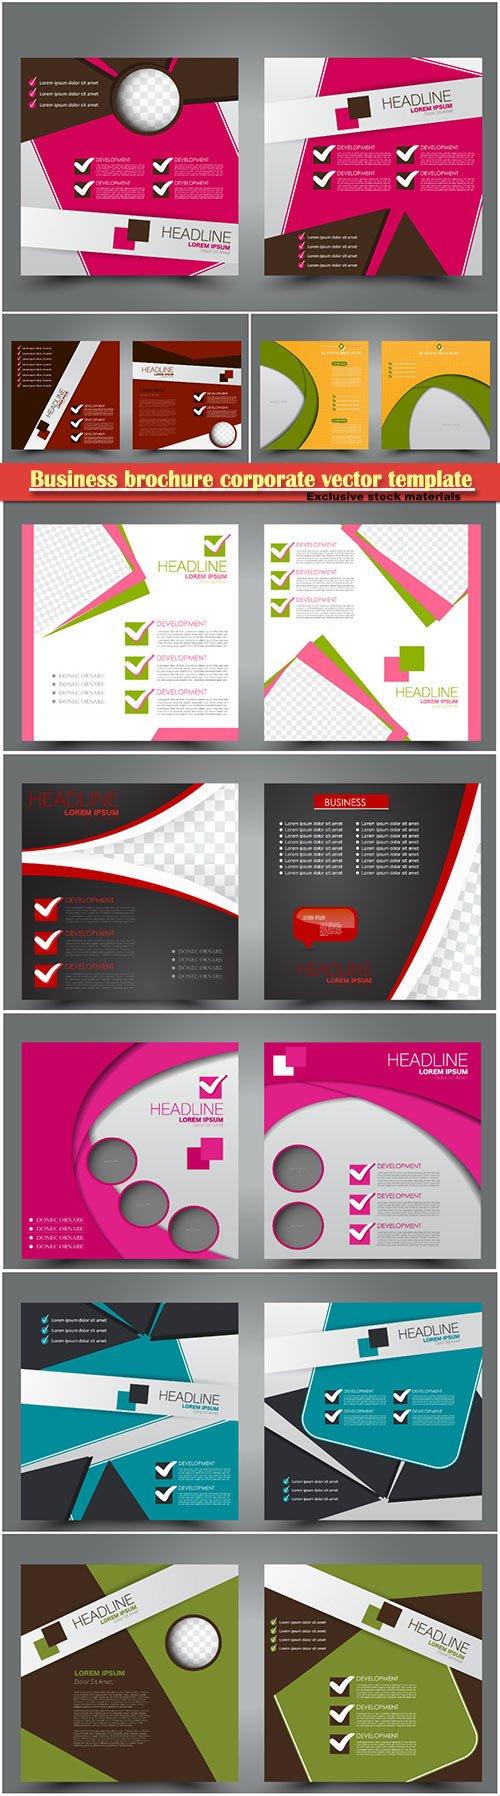 Business brochure corporate vector template, magazine flyer mockup # 14